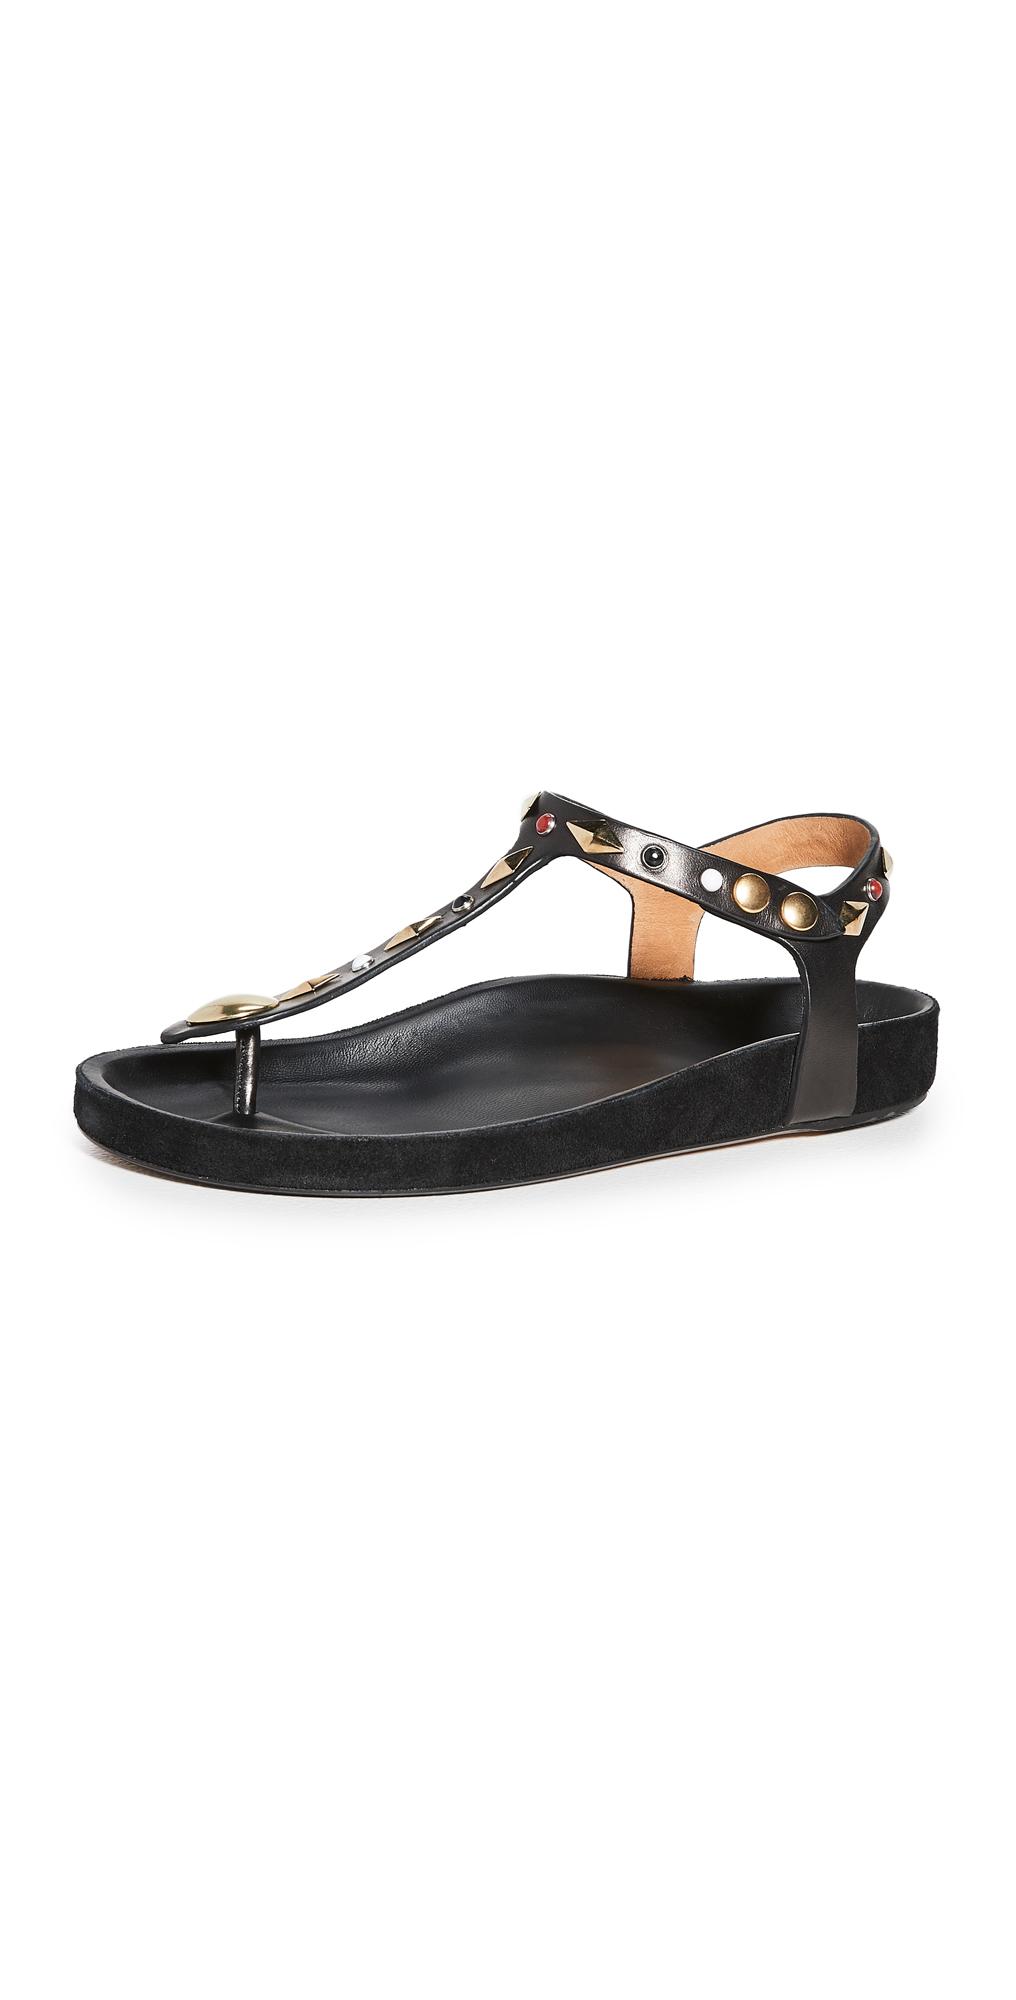 Isabel Marant Enore Sandals